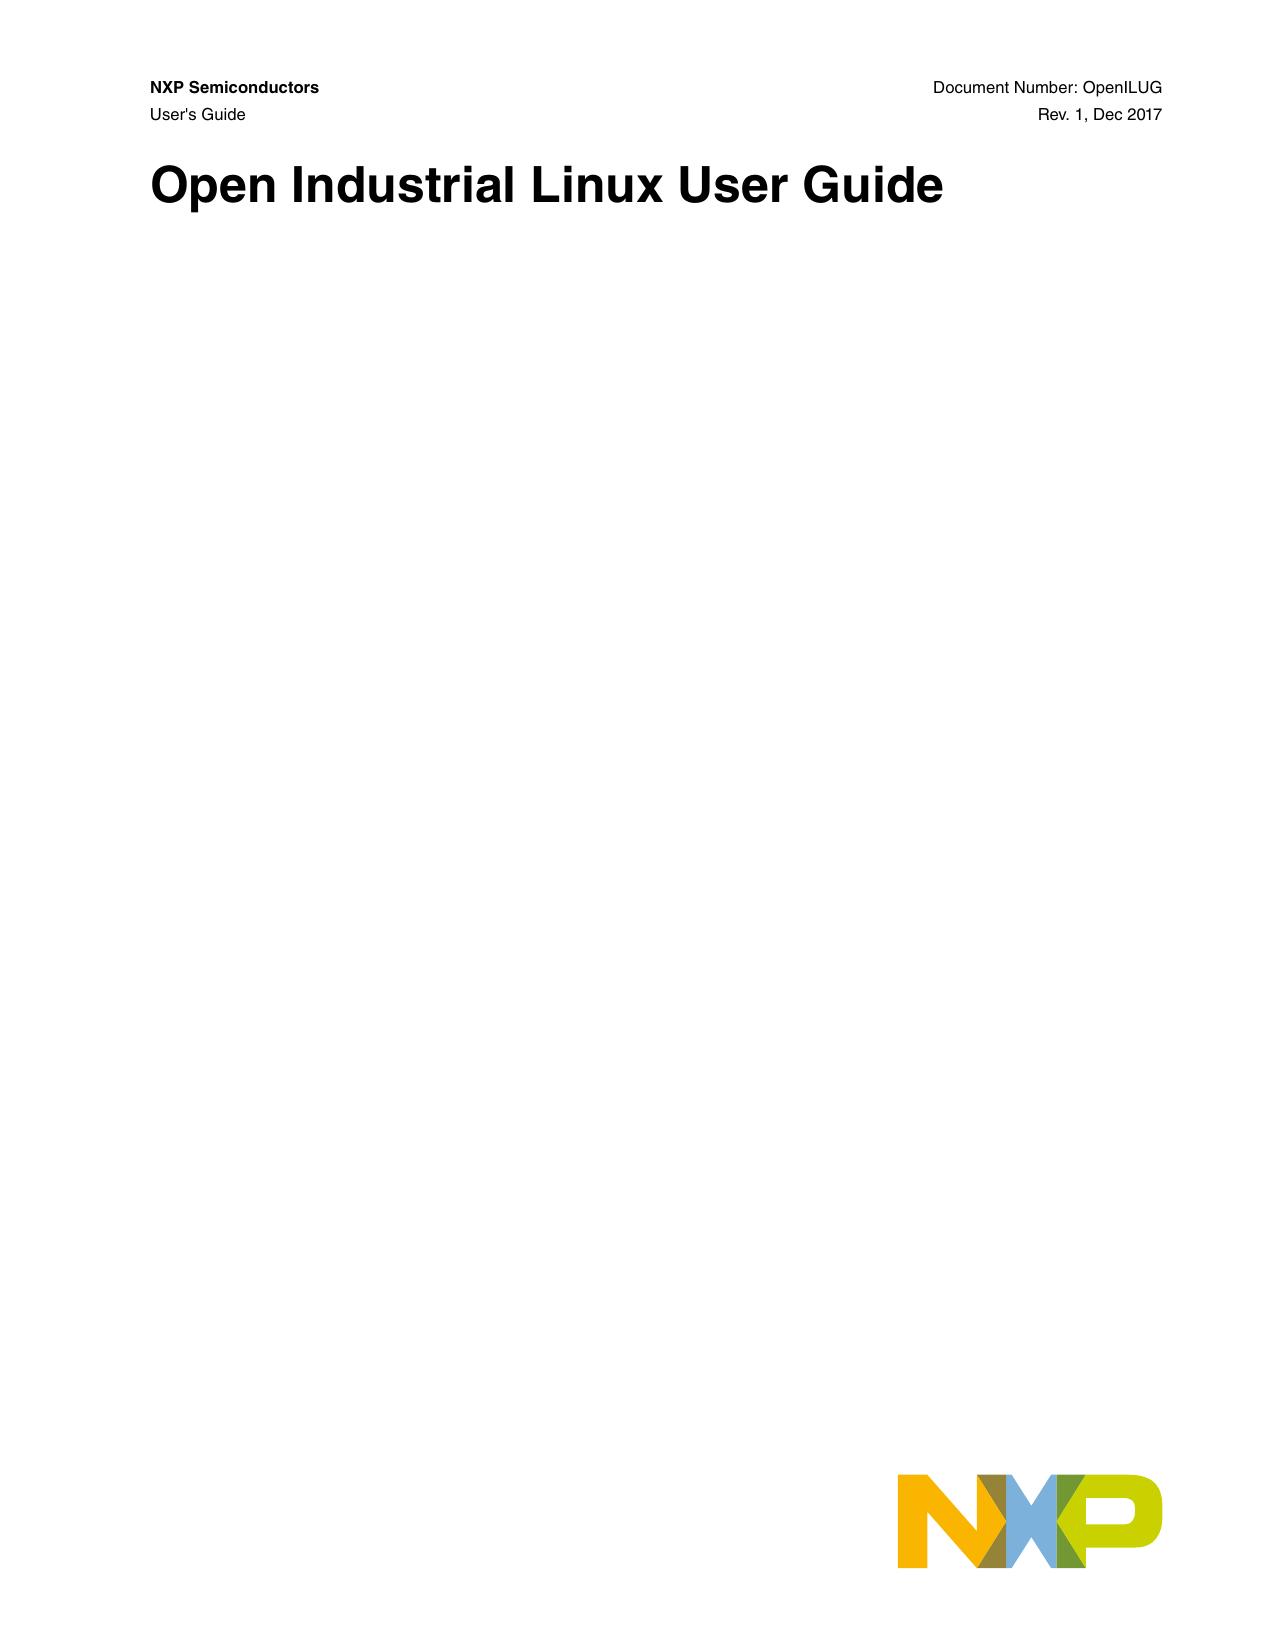 Open Industrial Linux User Guide | manualzz com